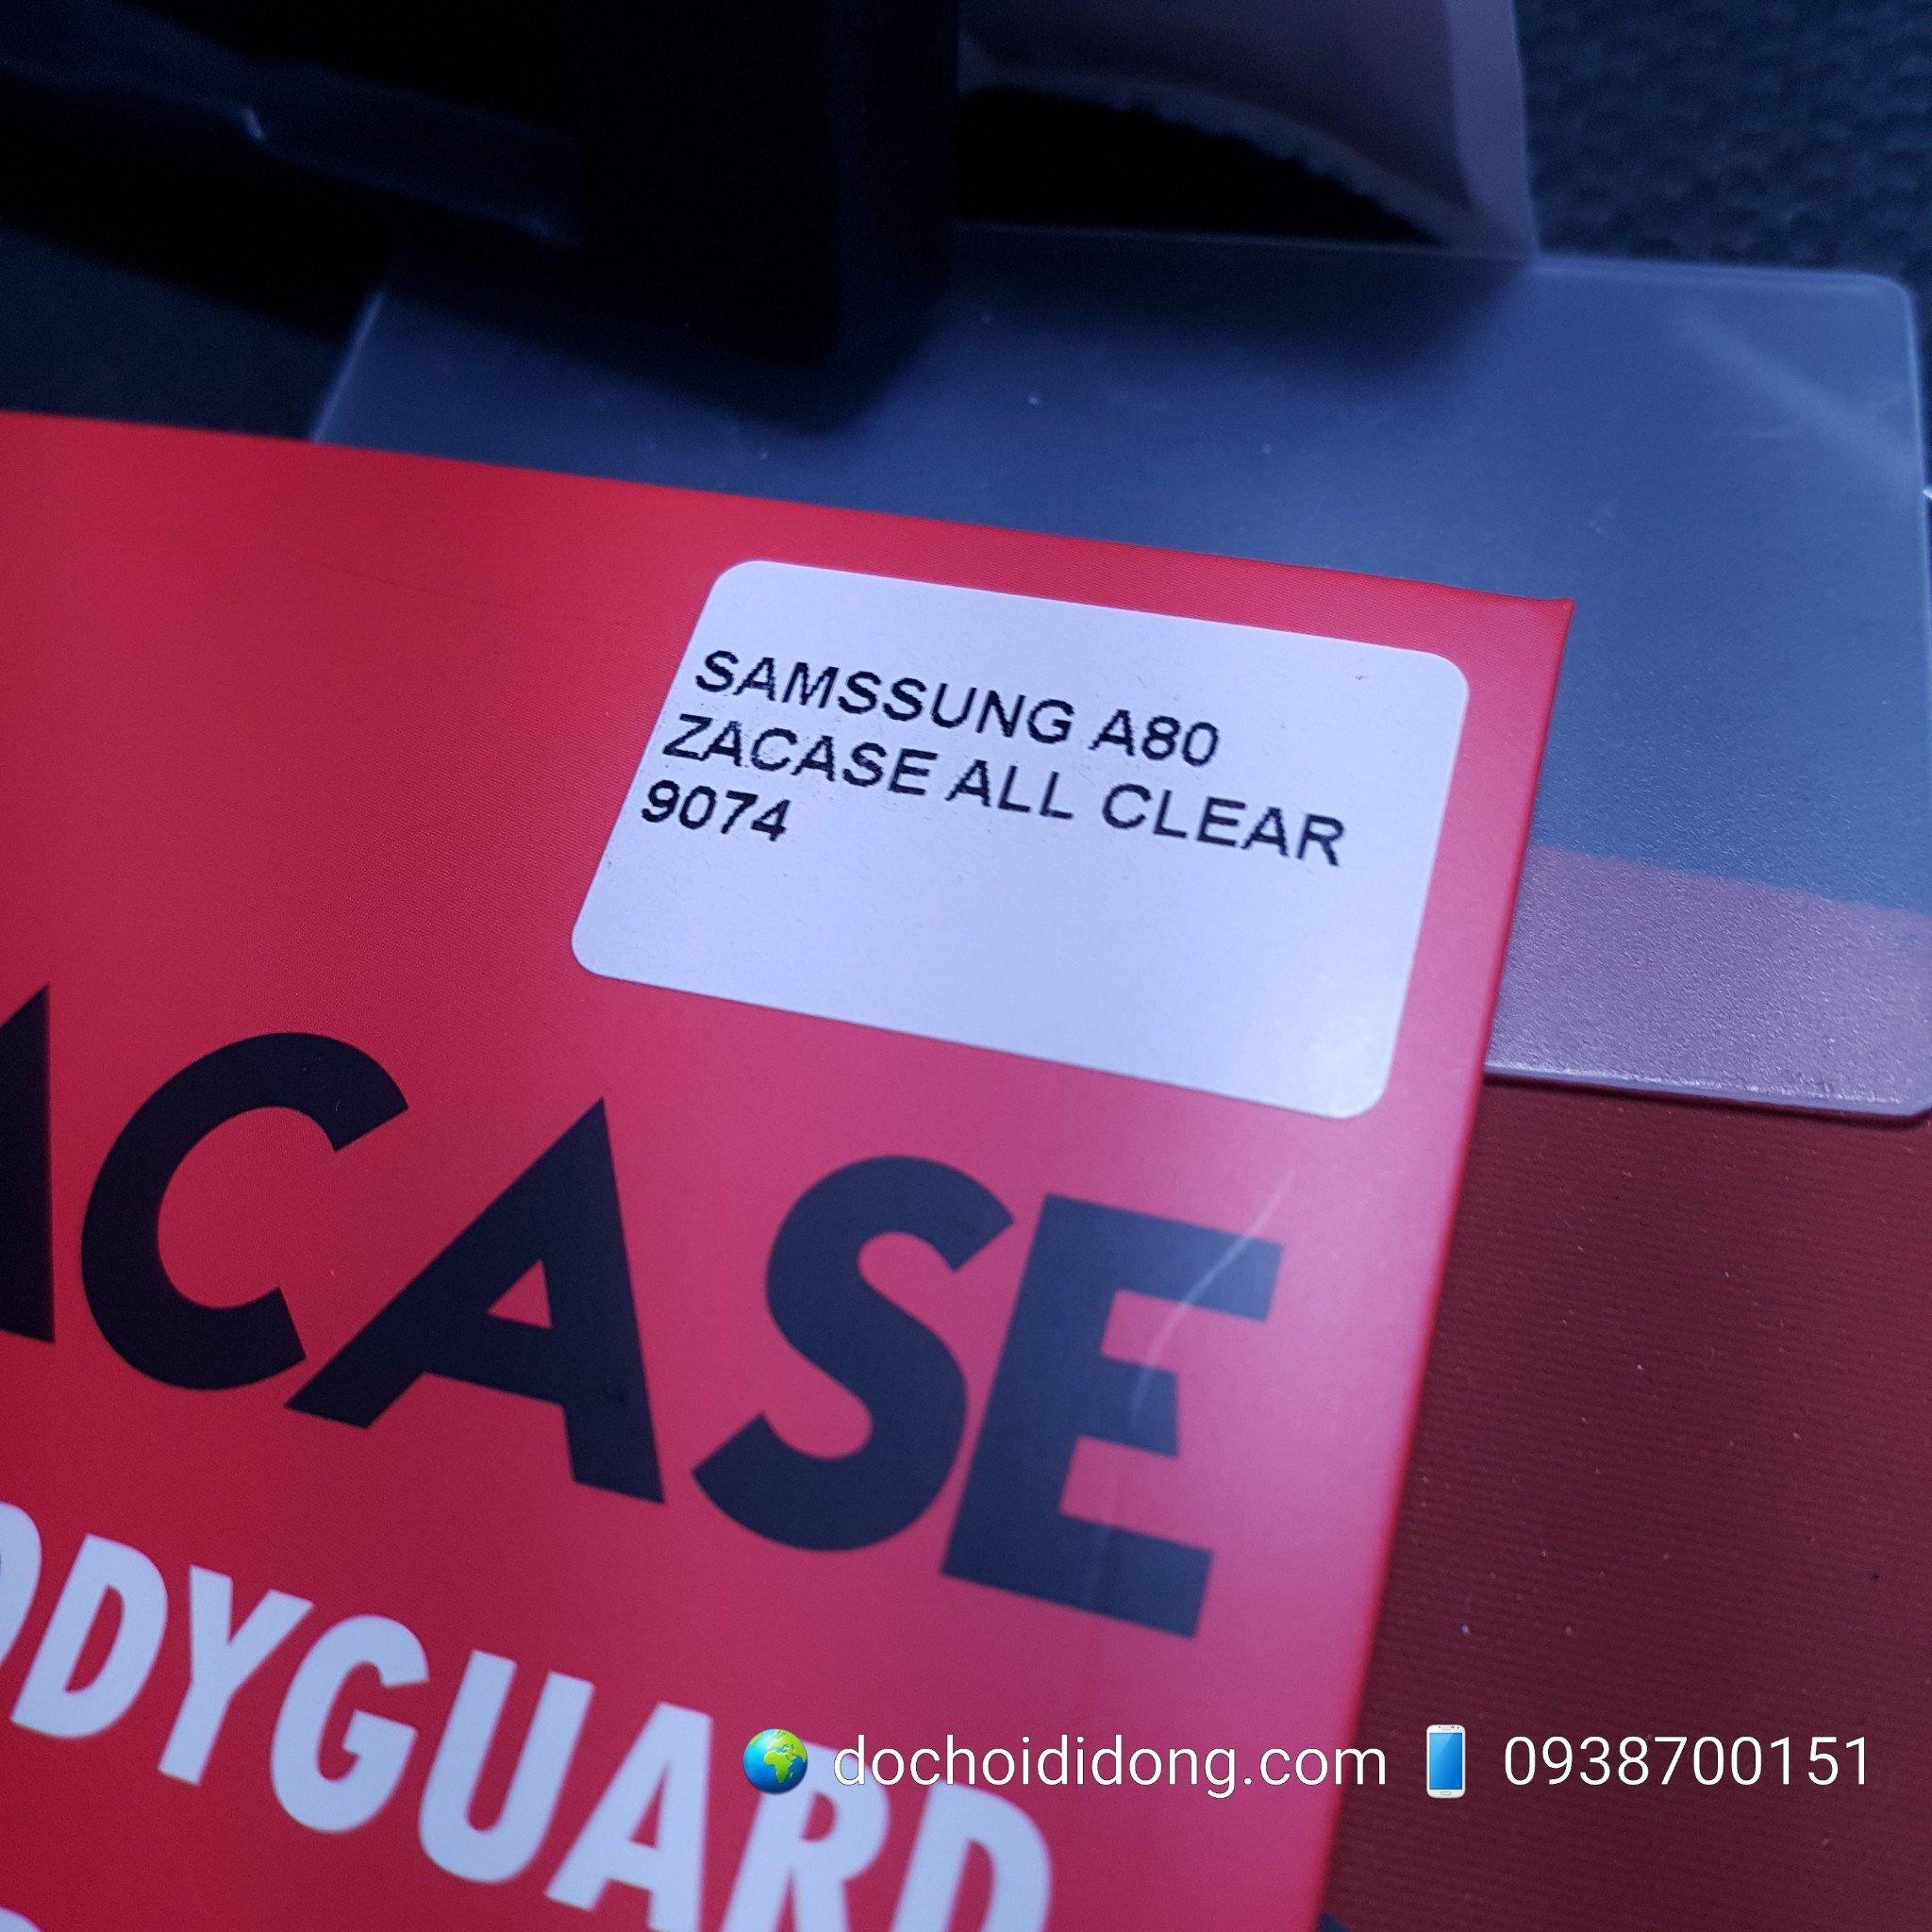 dan-cuong-luc-samsung-a80-zacase-all-clear